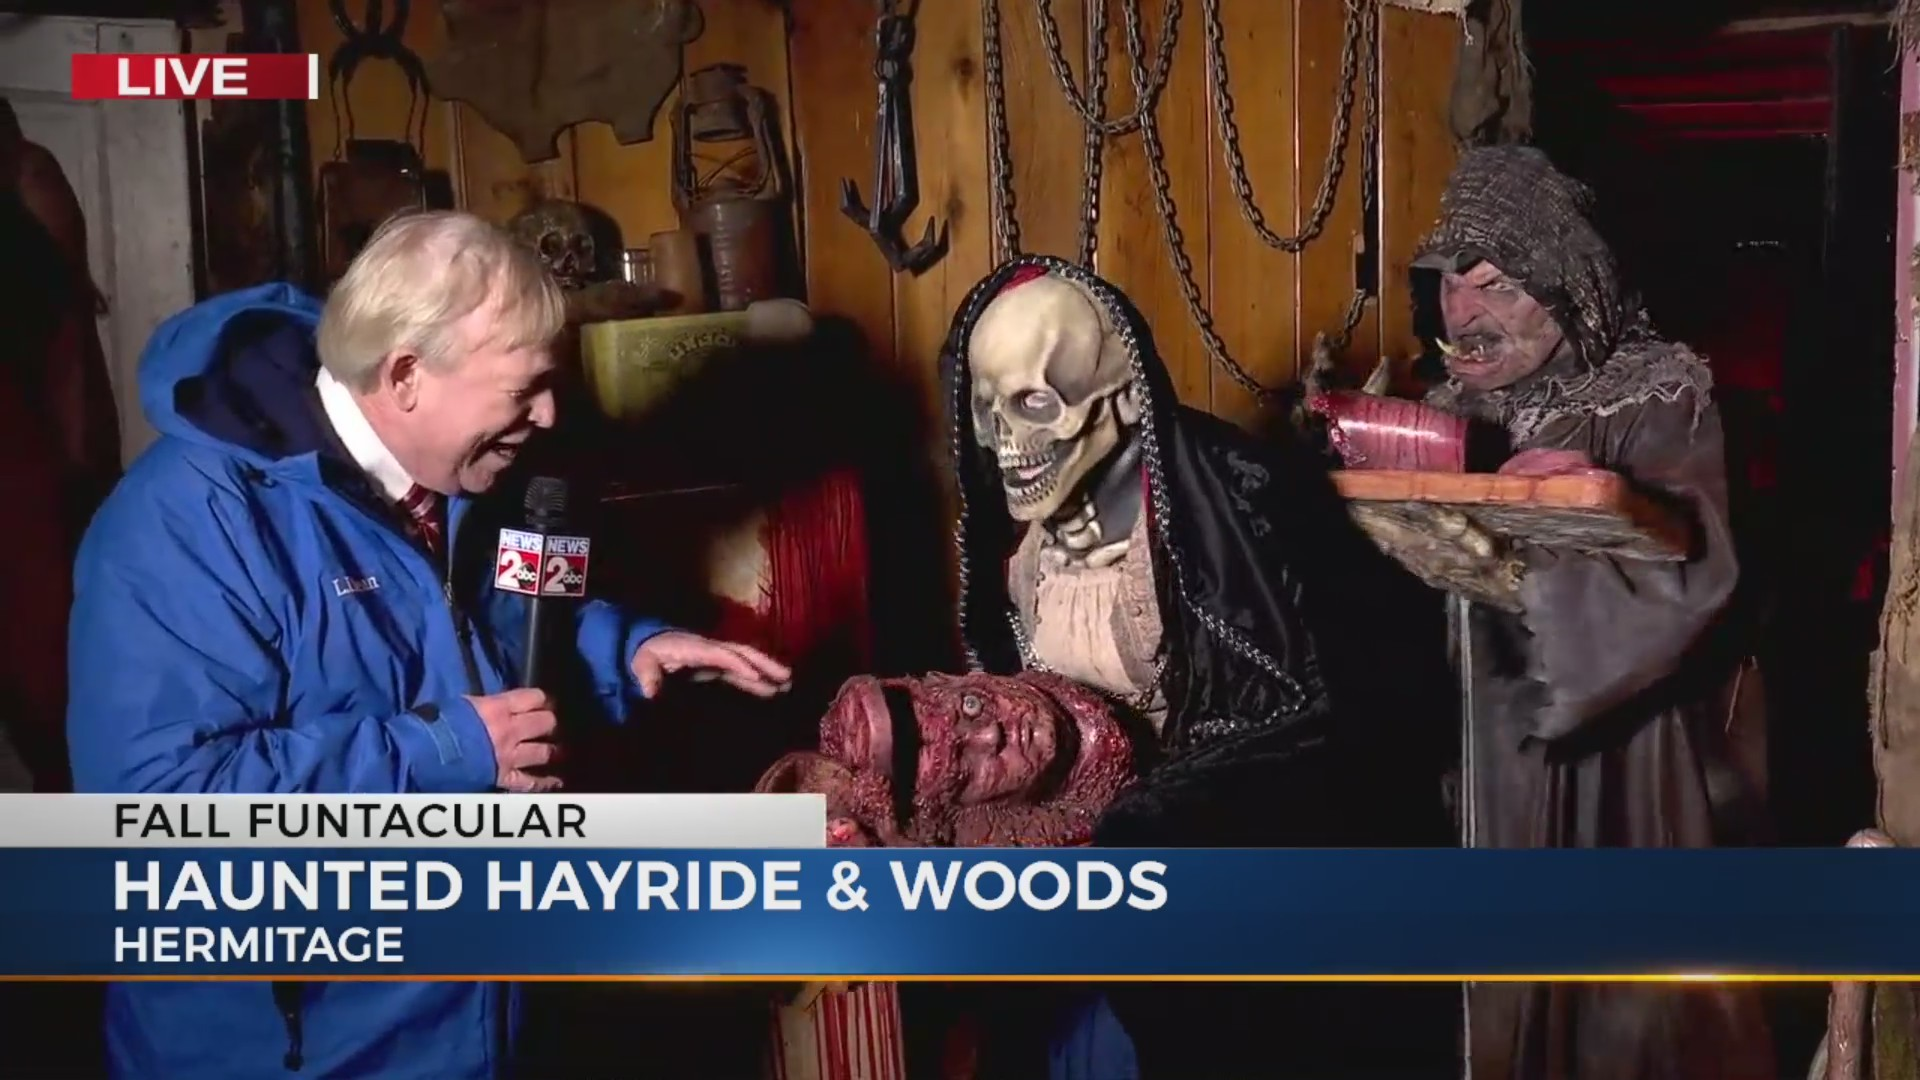 Davis Nolan's Fall Funtacular: Nashville Haunted Hayride & Woods